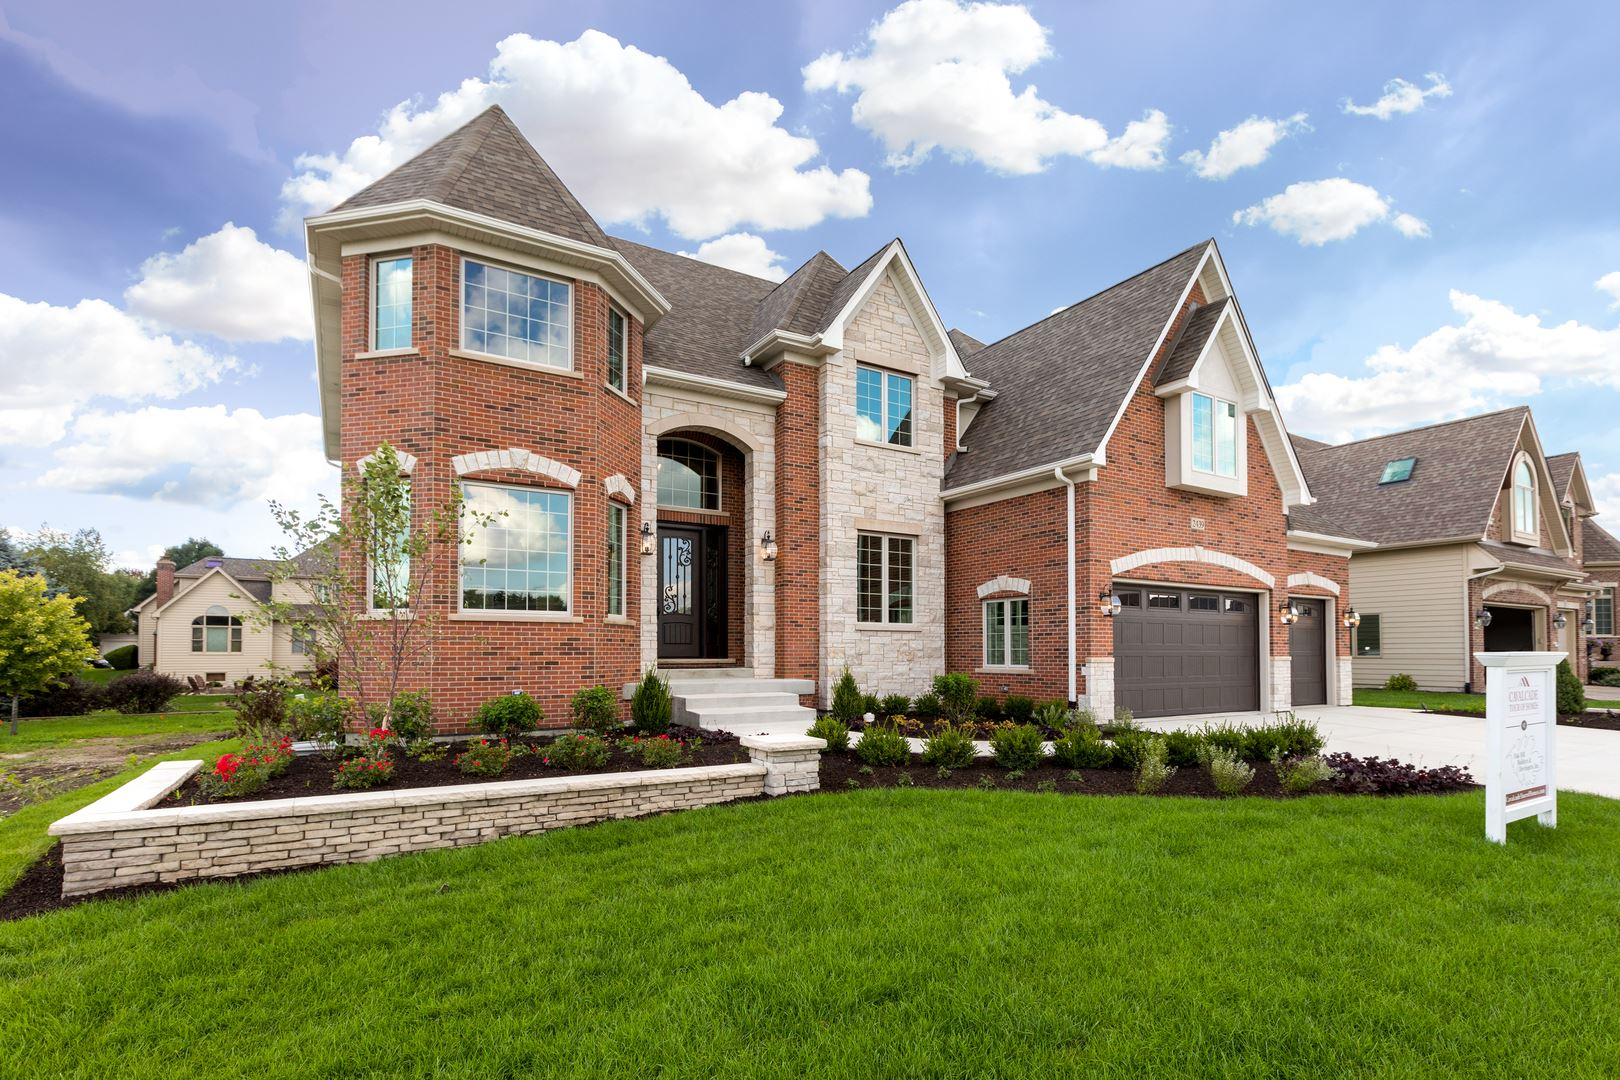 2439 Sharon Court, Naperville, IL 60564 - #: 10720830